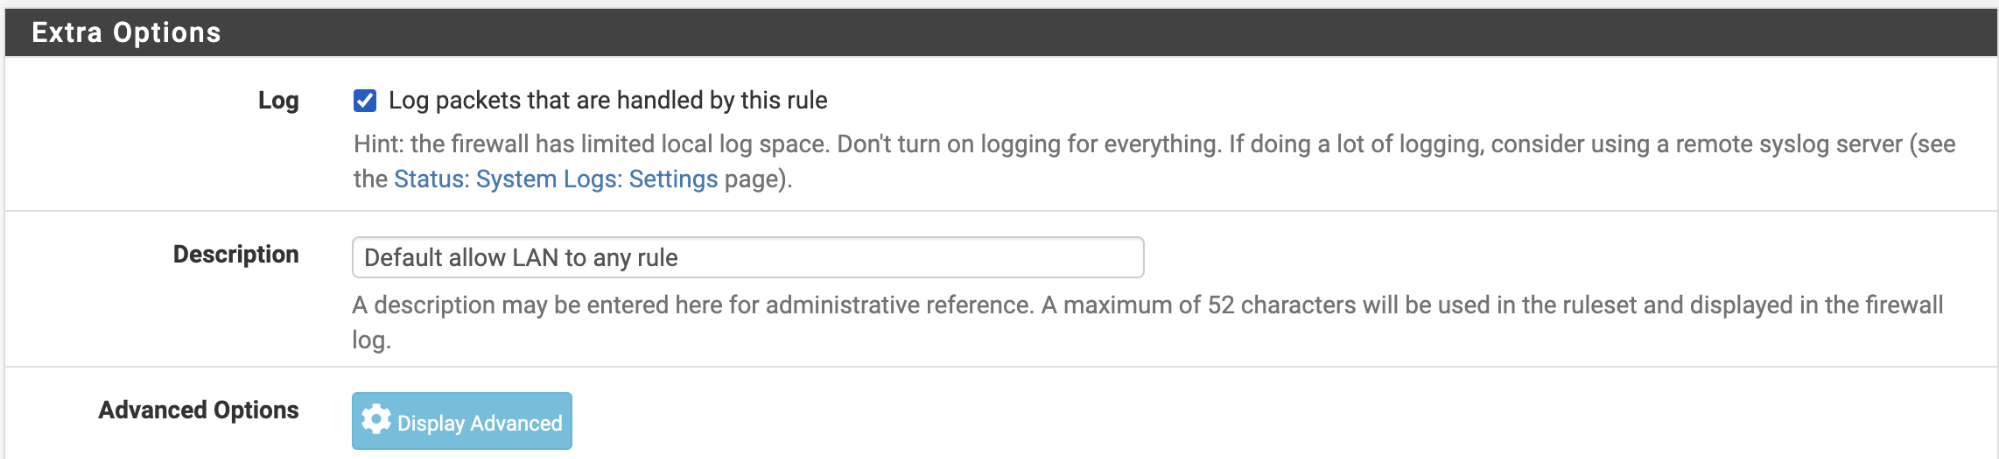 extra configuration options pfsense